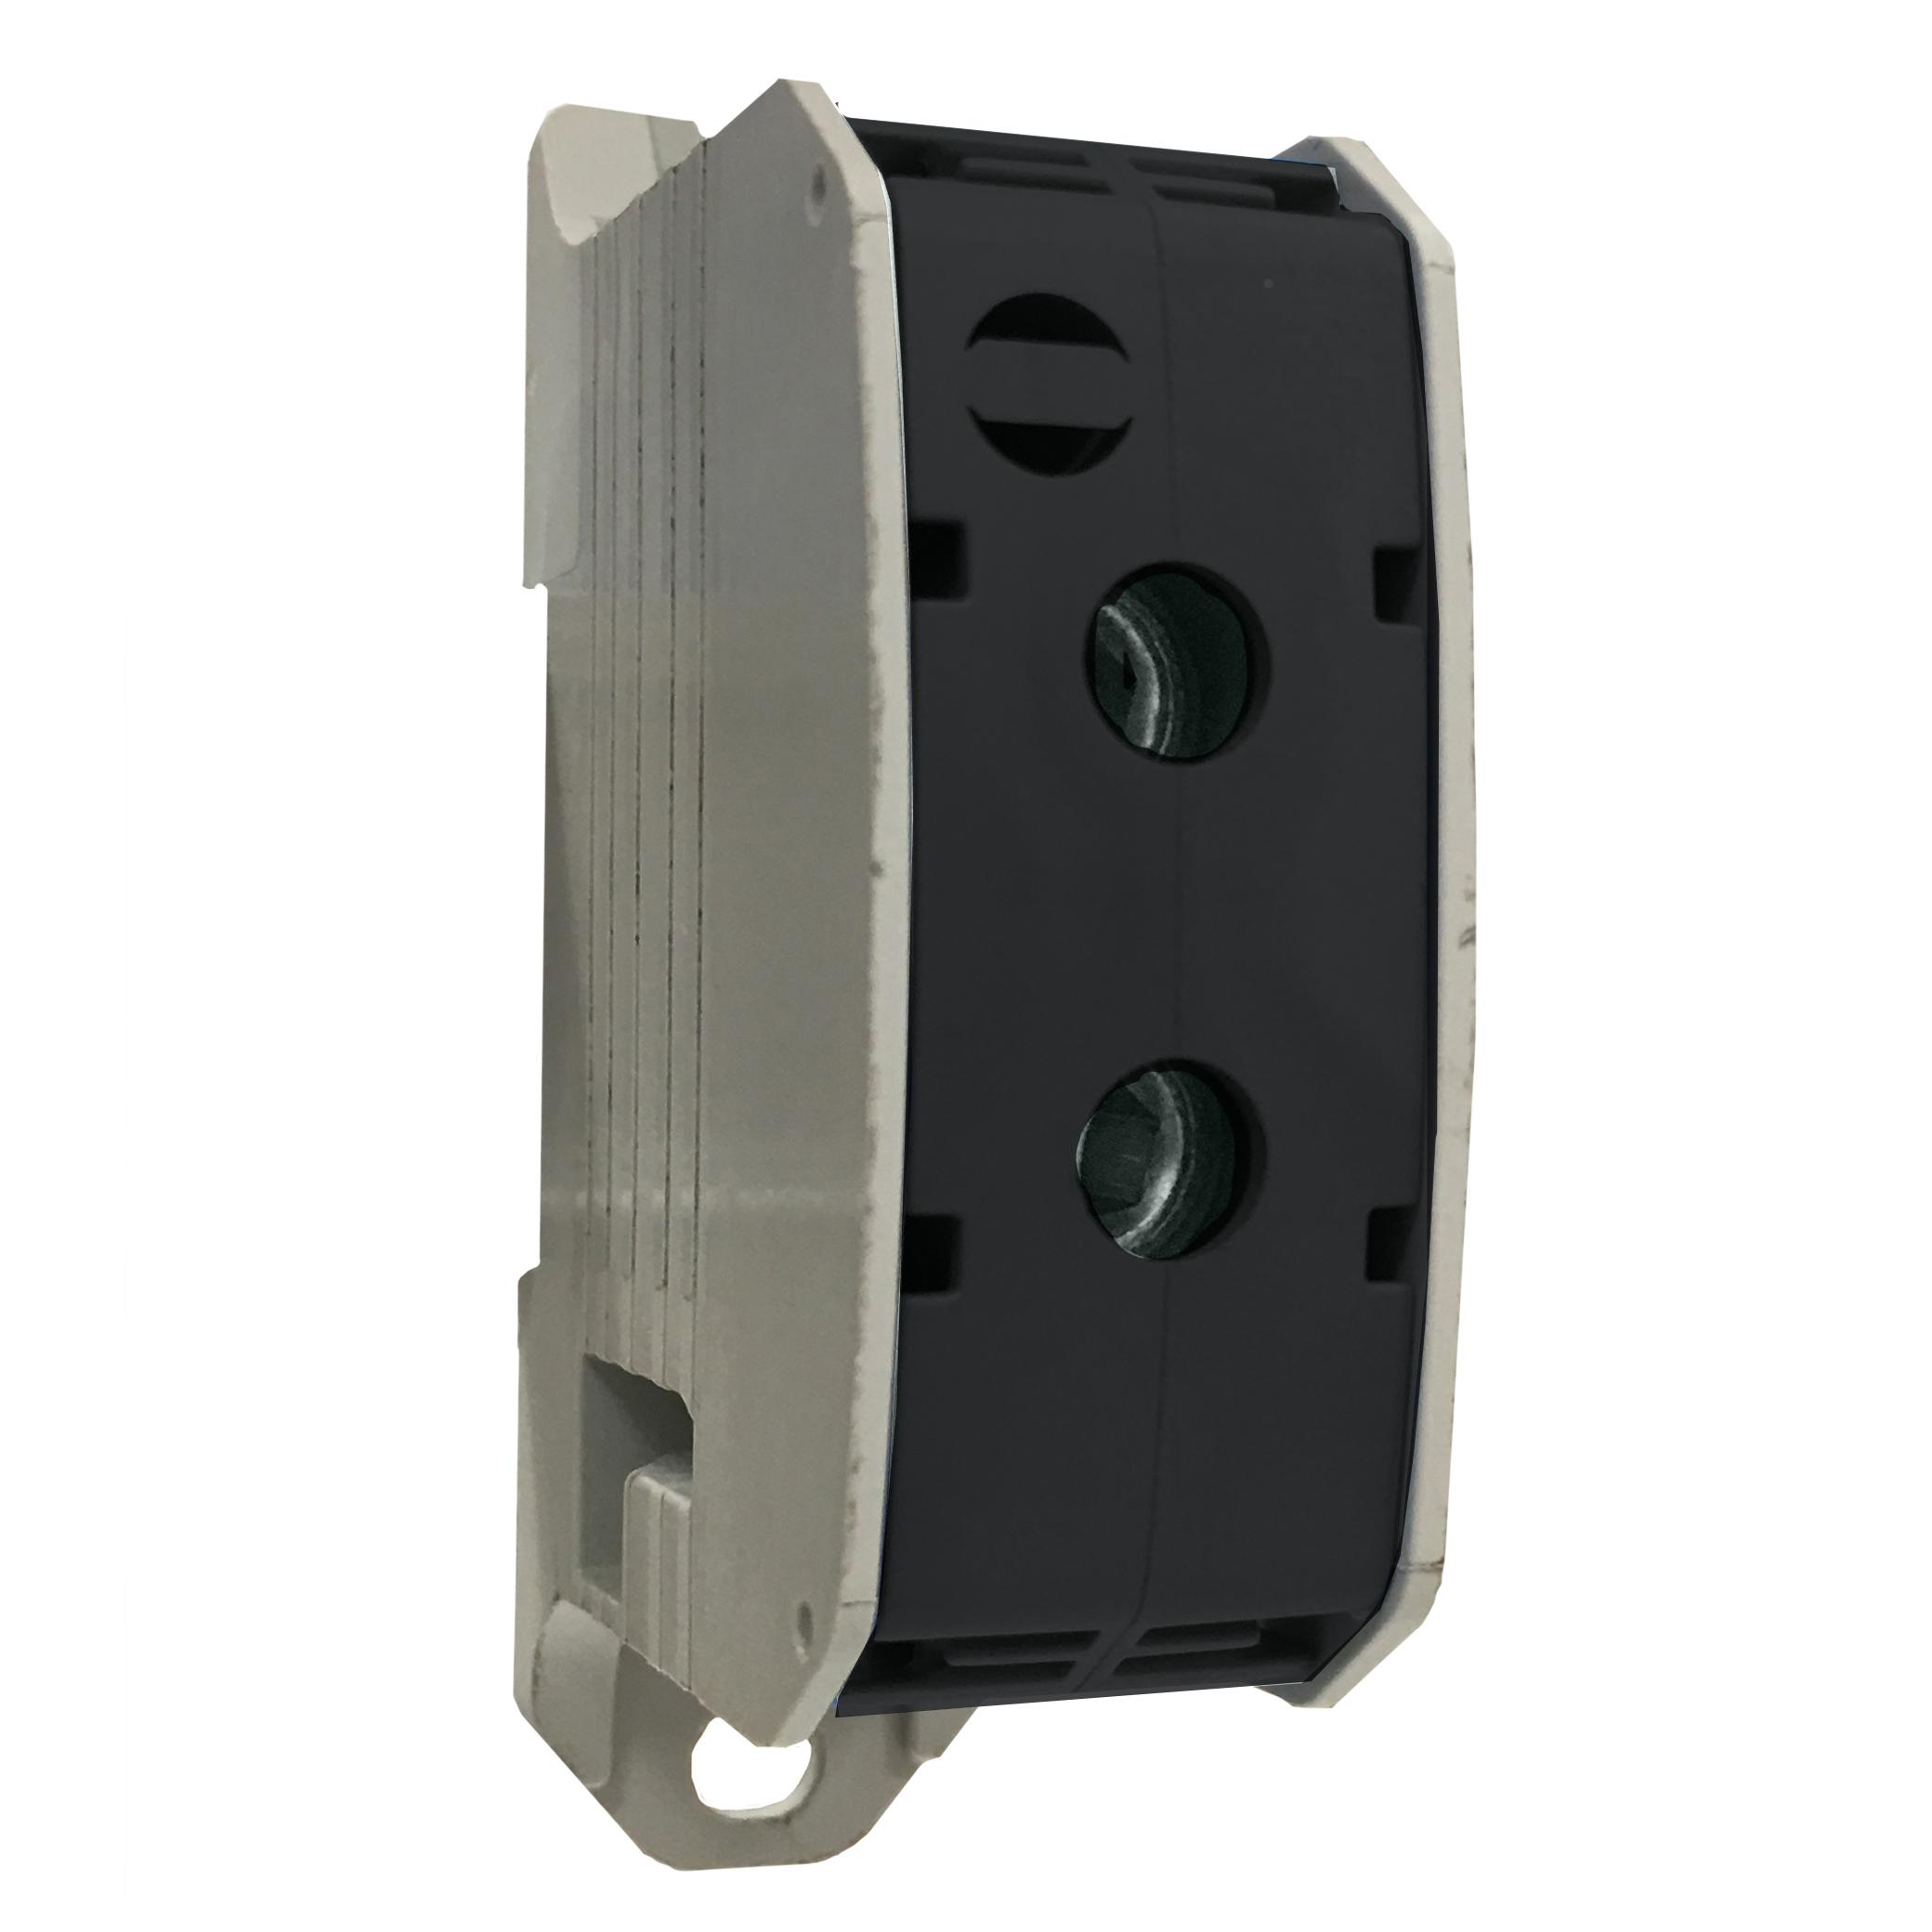 1 Stk Aluminium /Kupfer Klemme, 1-polig, 50mm² schwarz IKA21350--